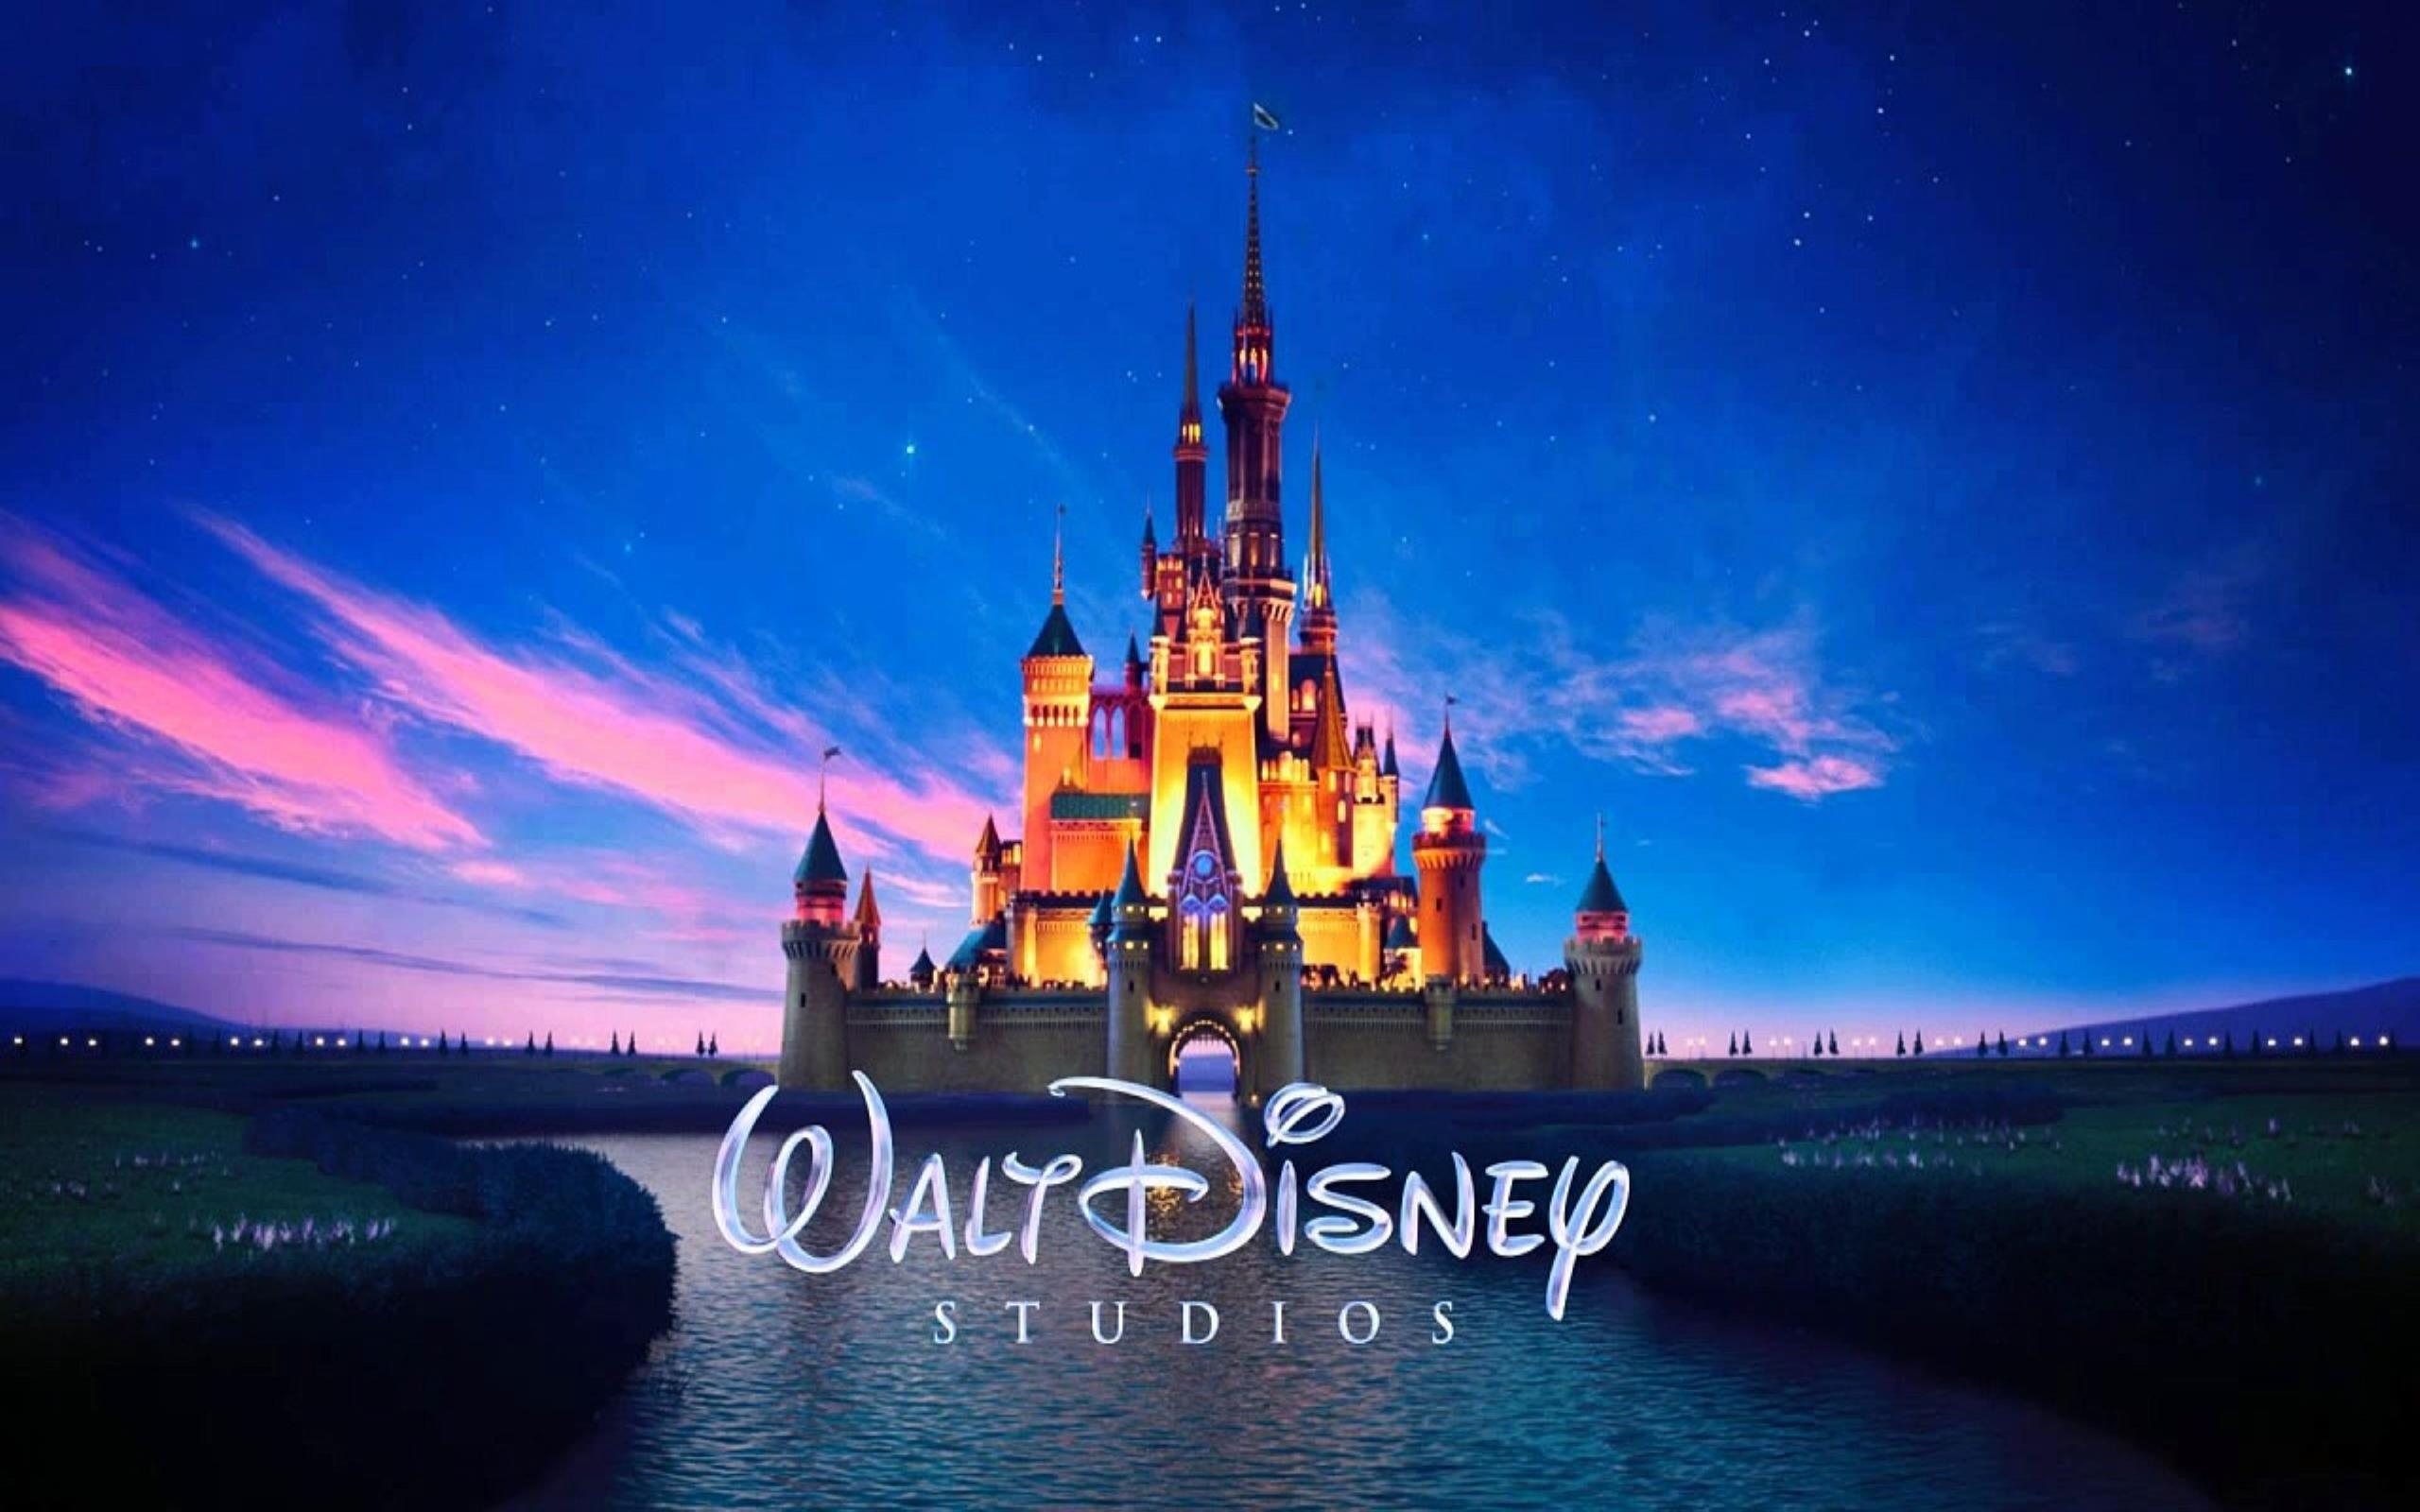 4k Disney Wallpapers Top Free 4k Disney Backgrounds Wallpaperaccess